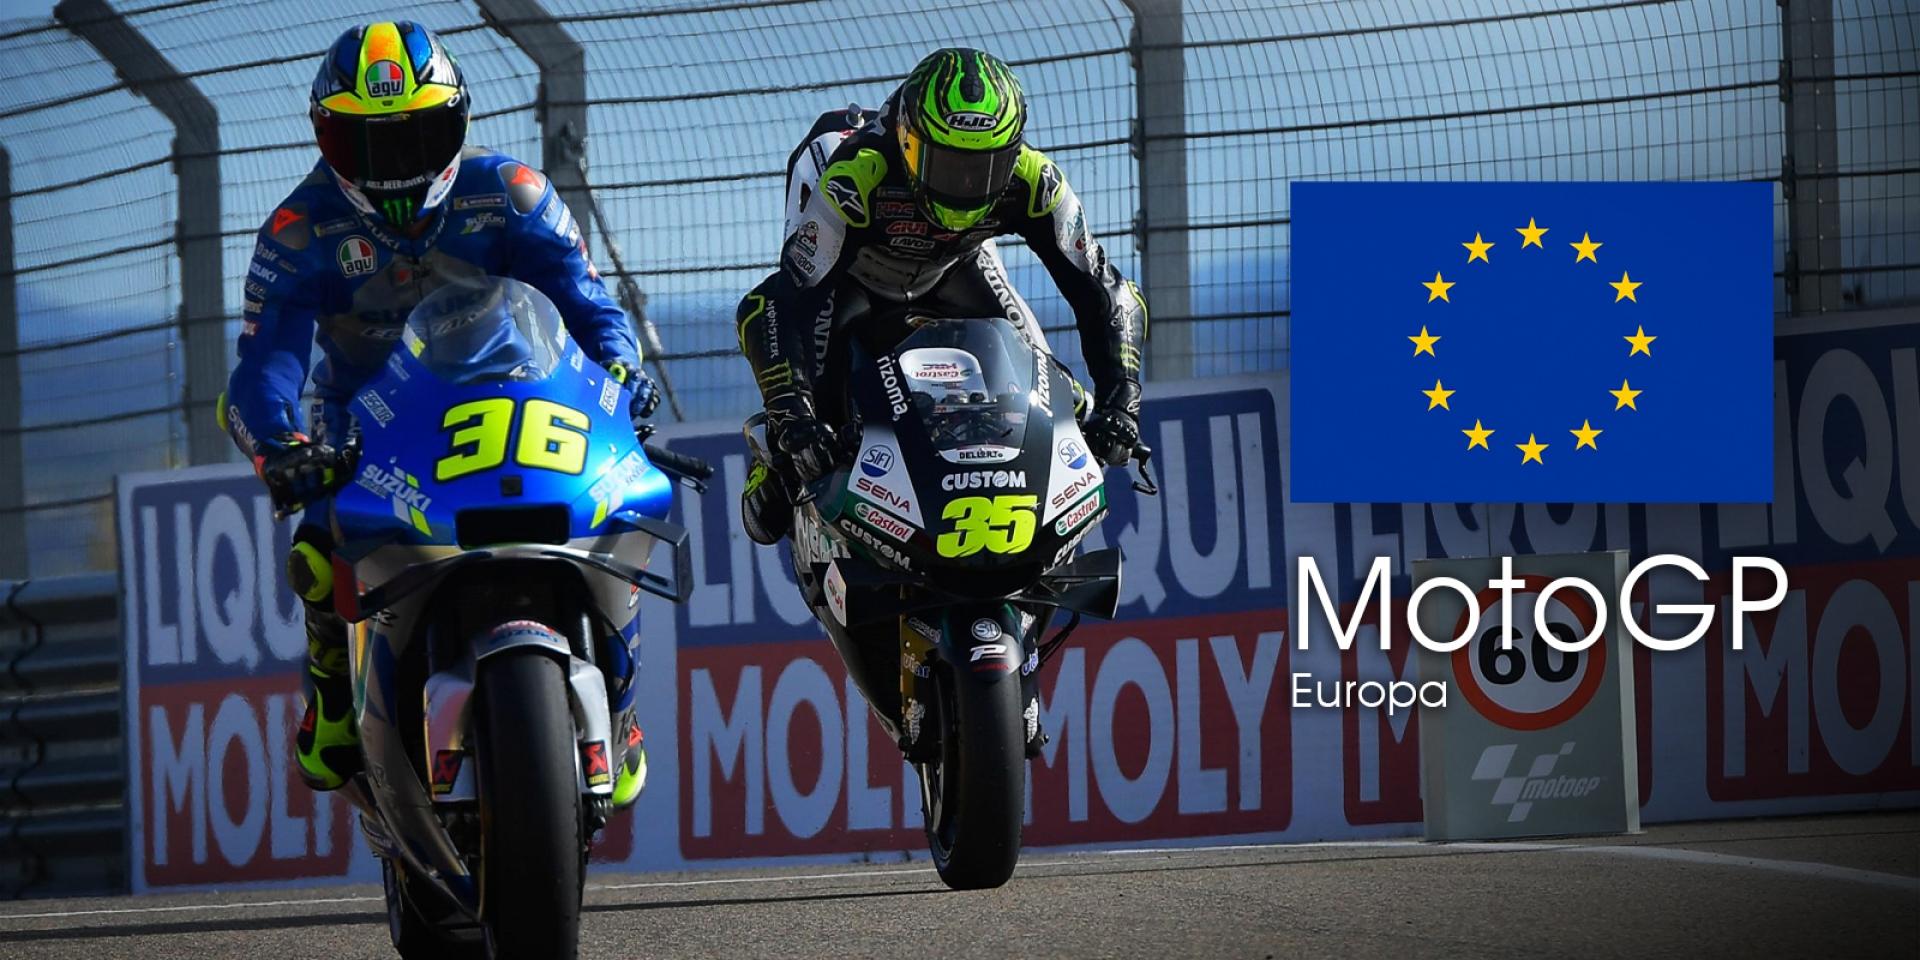 MotoGP 2020 歐洲站 轉播時間